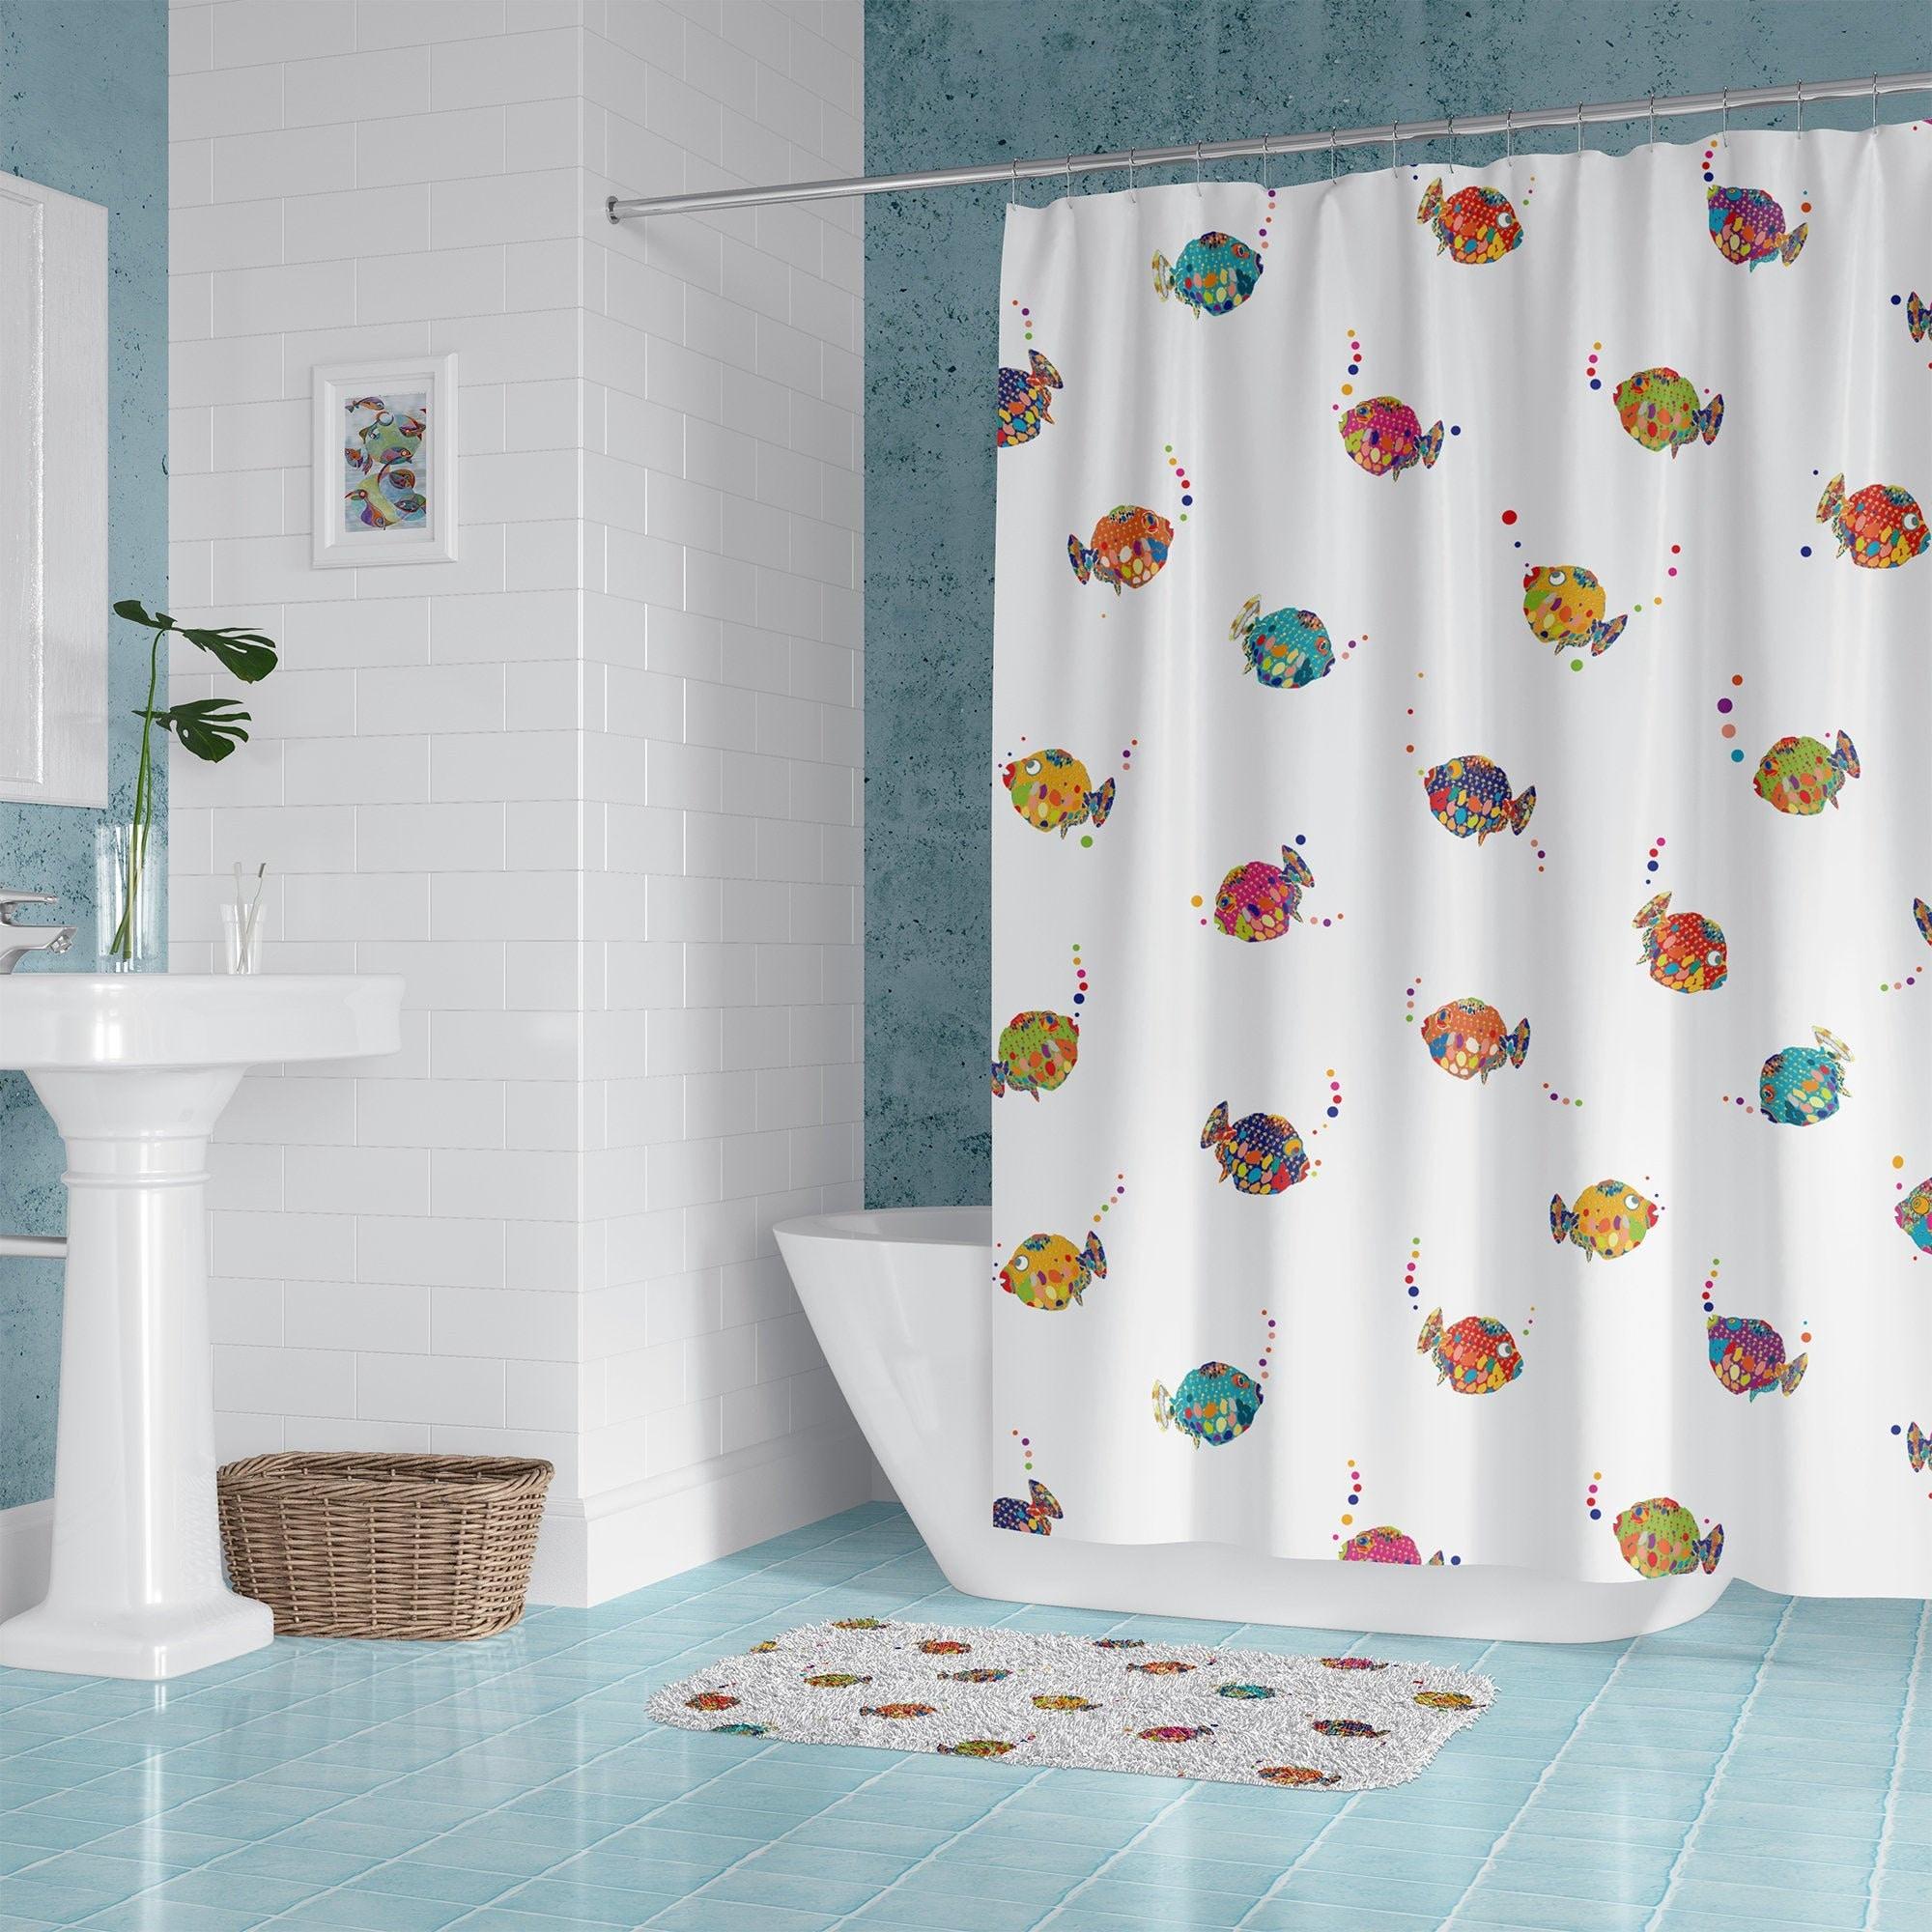 Colorful Kids Bathroom Decor Tropical, Fish Bathroom Set